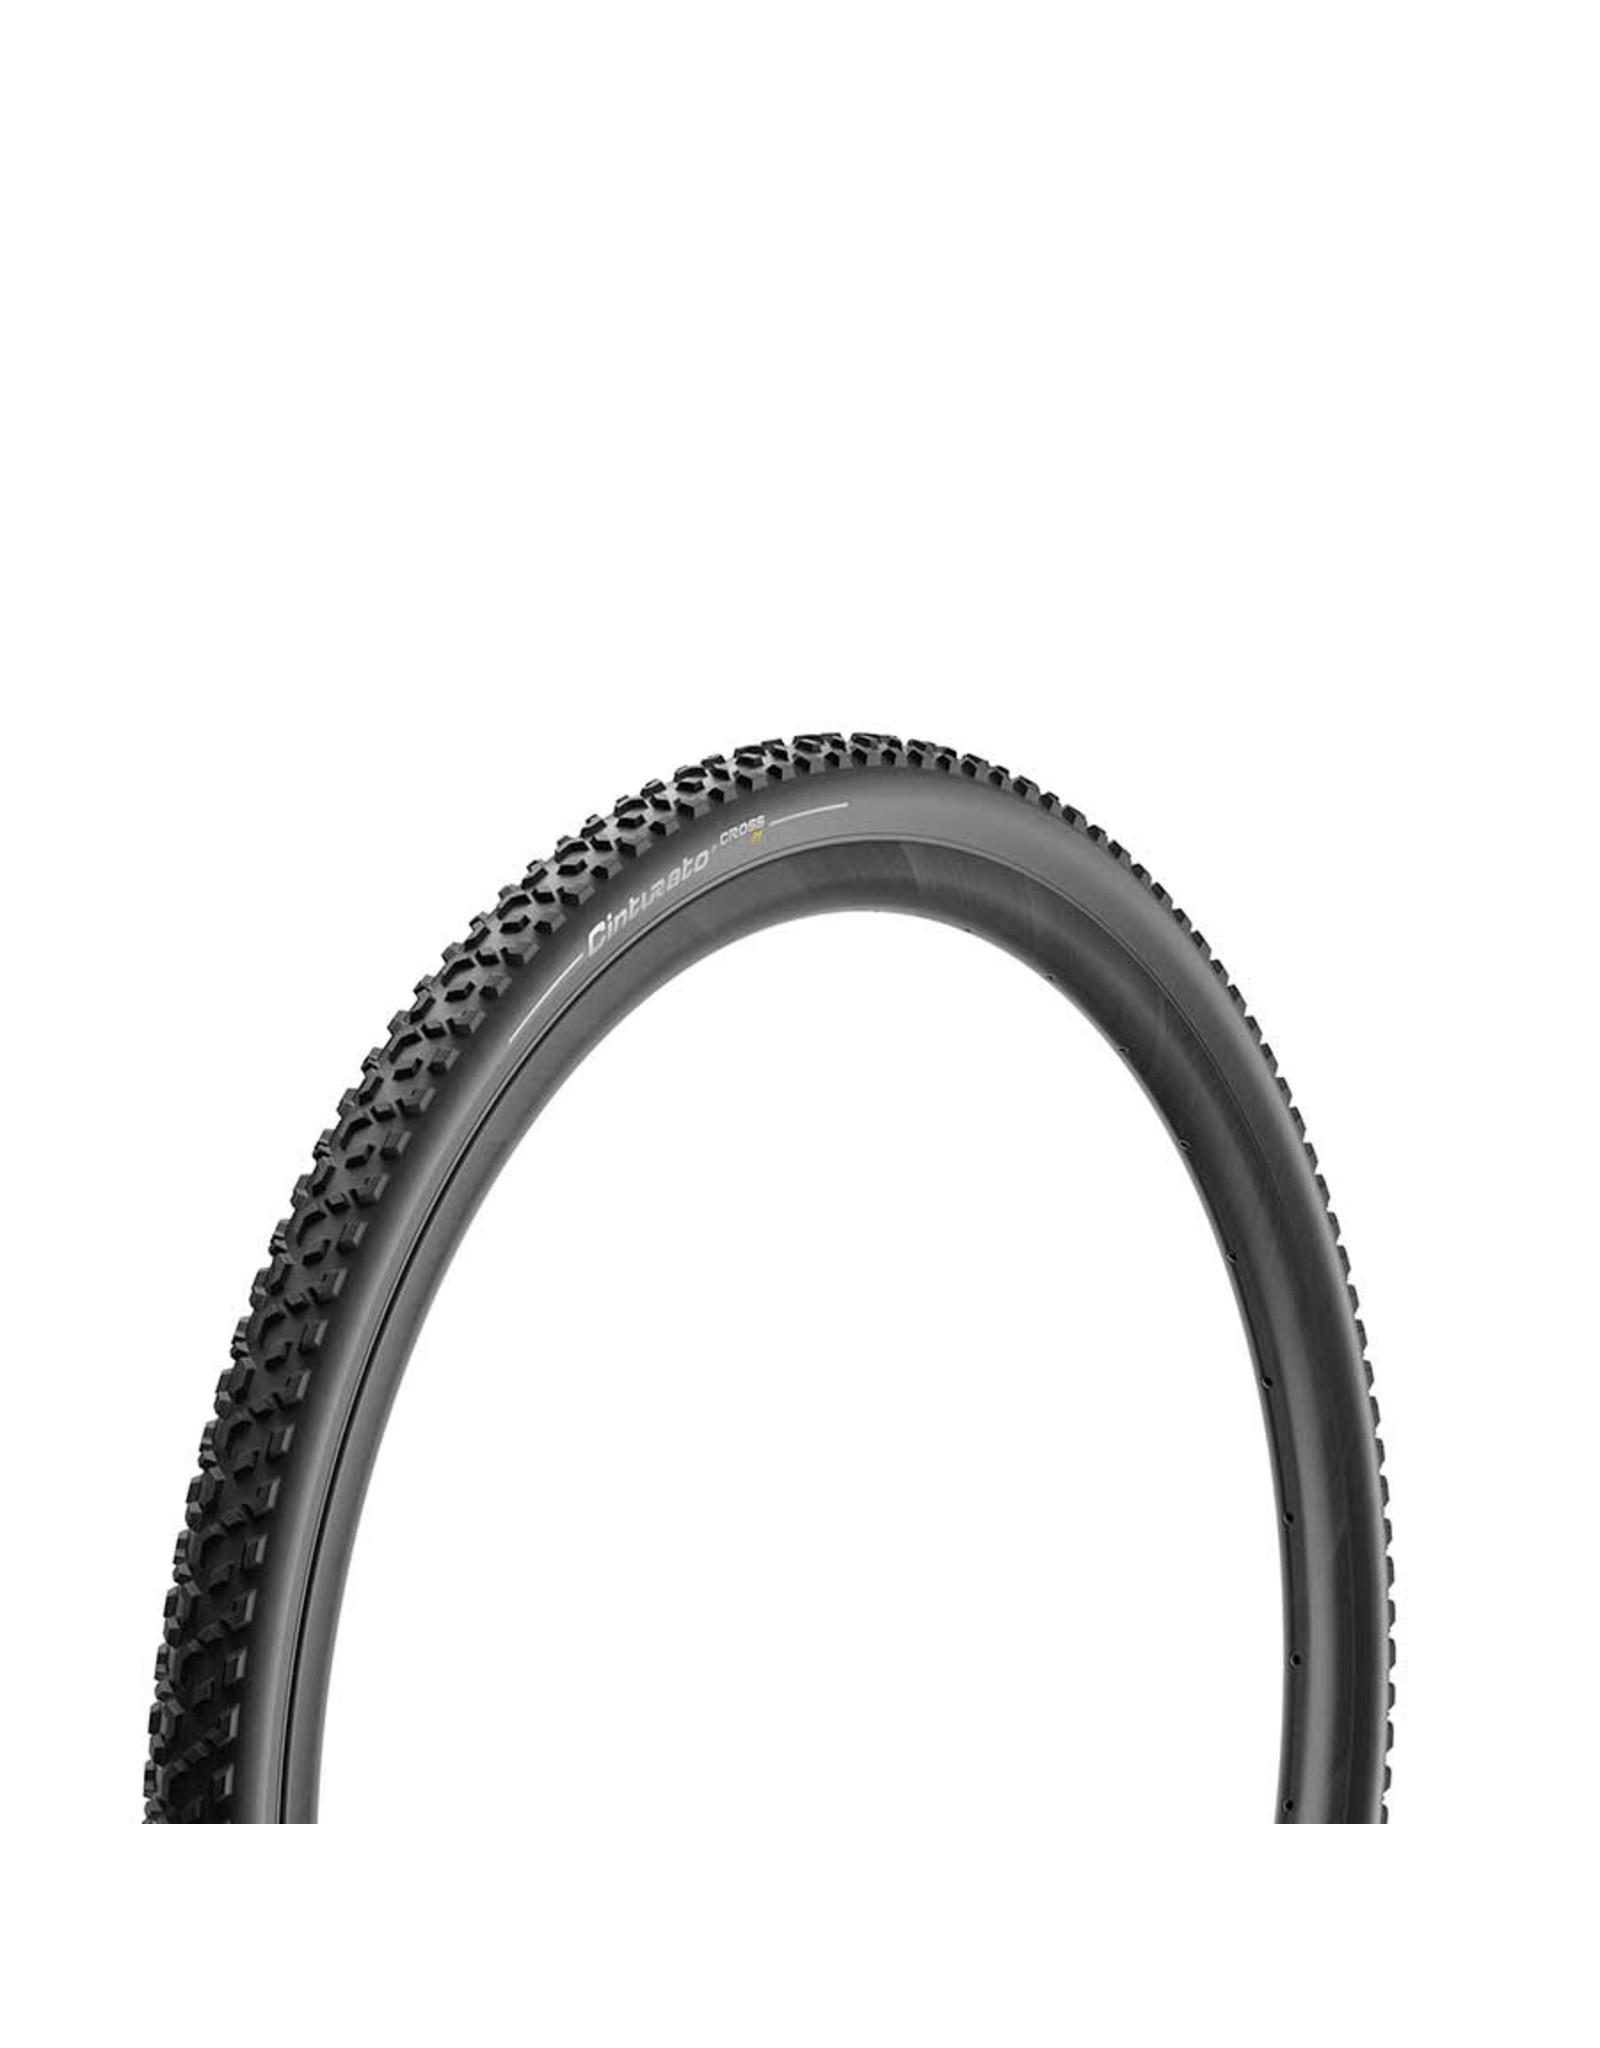 Pirelli Pirelli, Cinturato Cross M, Tire, 700x33C, Folding, Tubeless Ready, SpeedGrip, 127TPI, Black